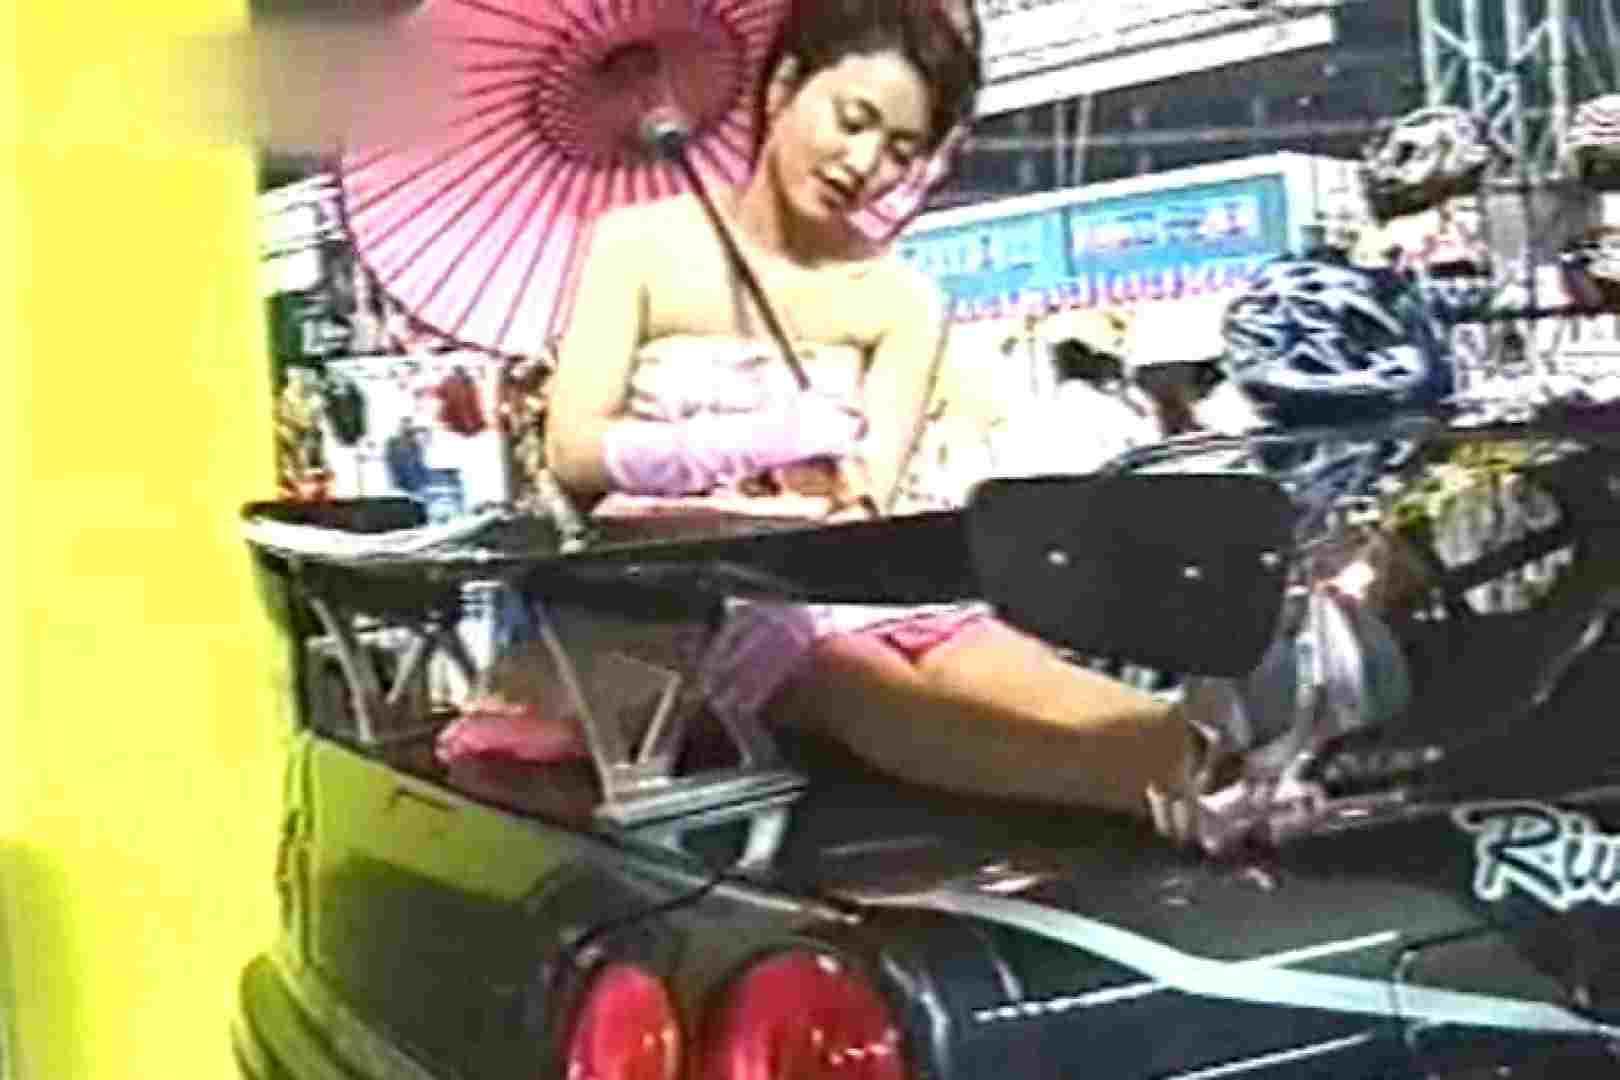 RQカメラ地獄Vol.24 お姉さんのエッチ  74PIX 22